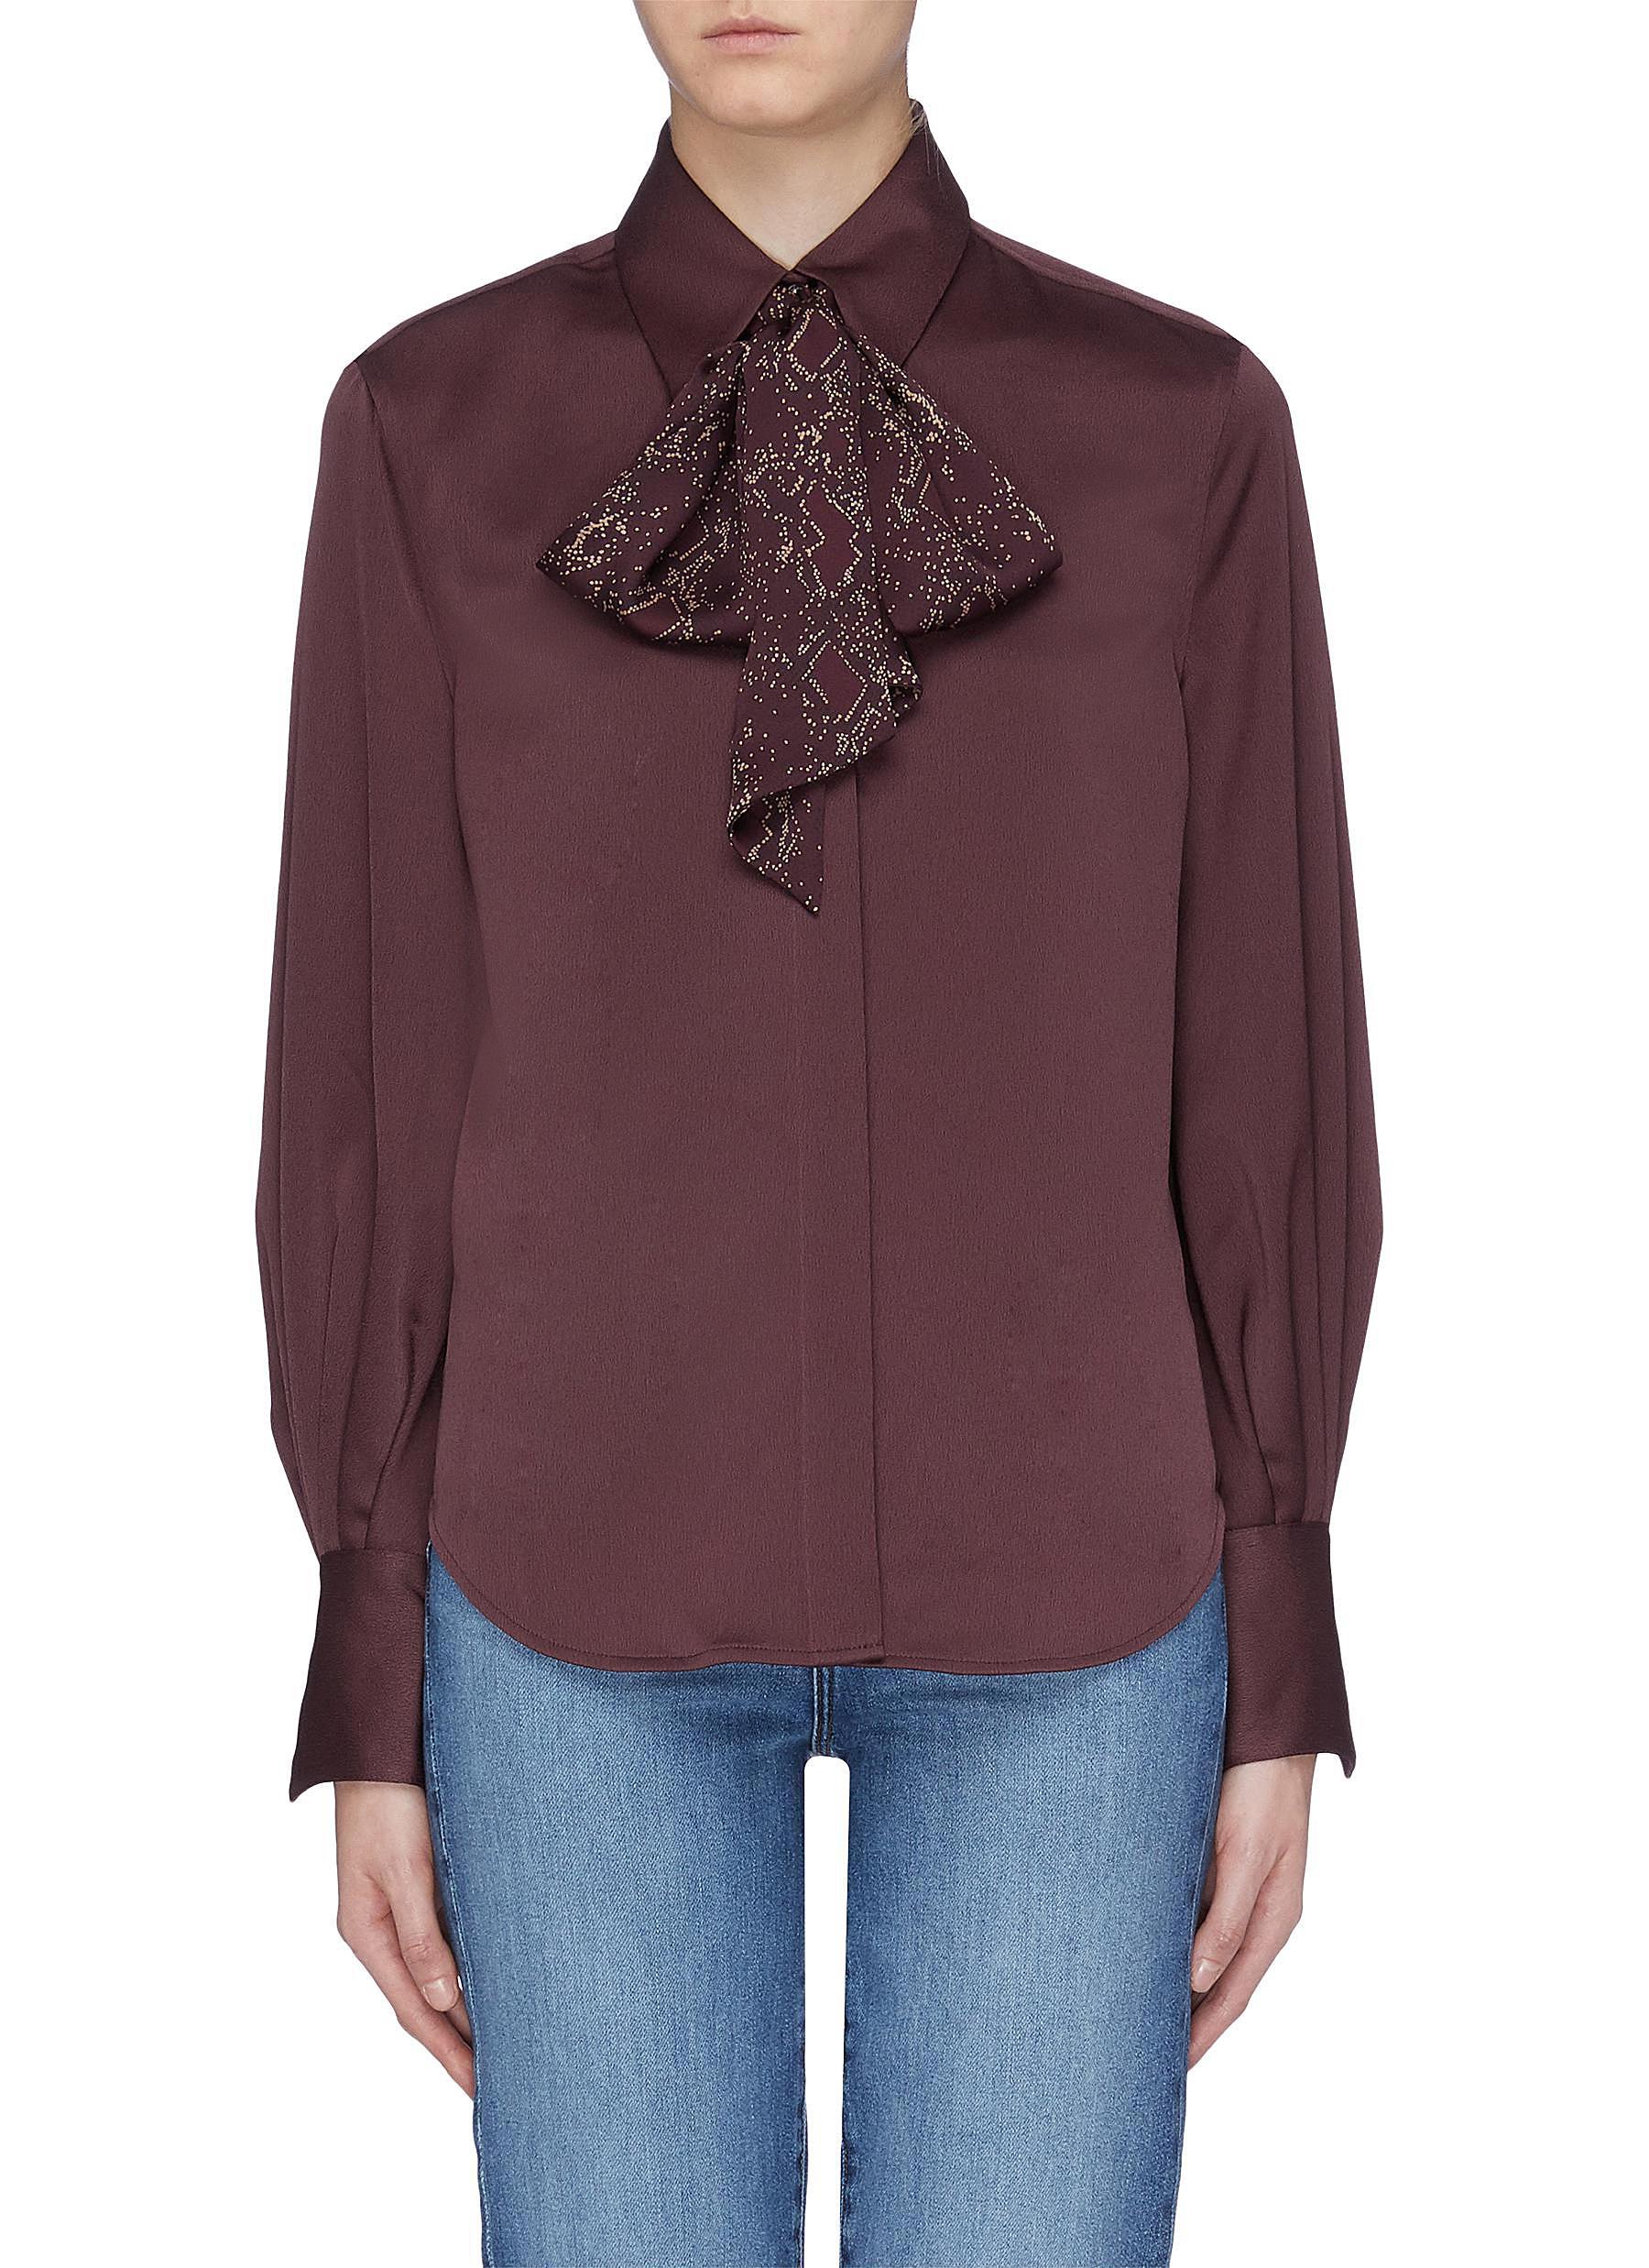 Didina sash scarf collar bishop sleeve shirt by Equipment